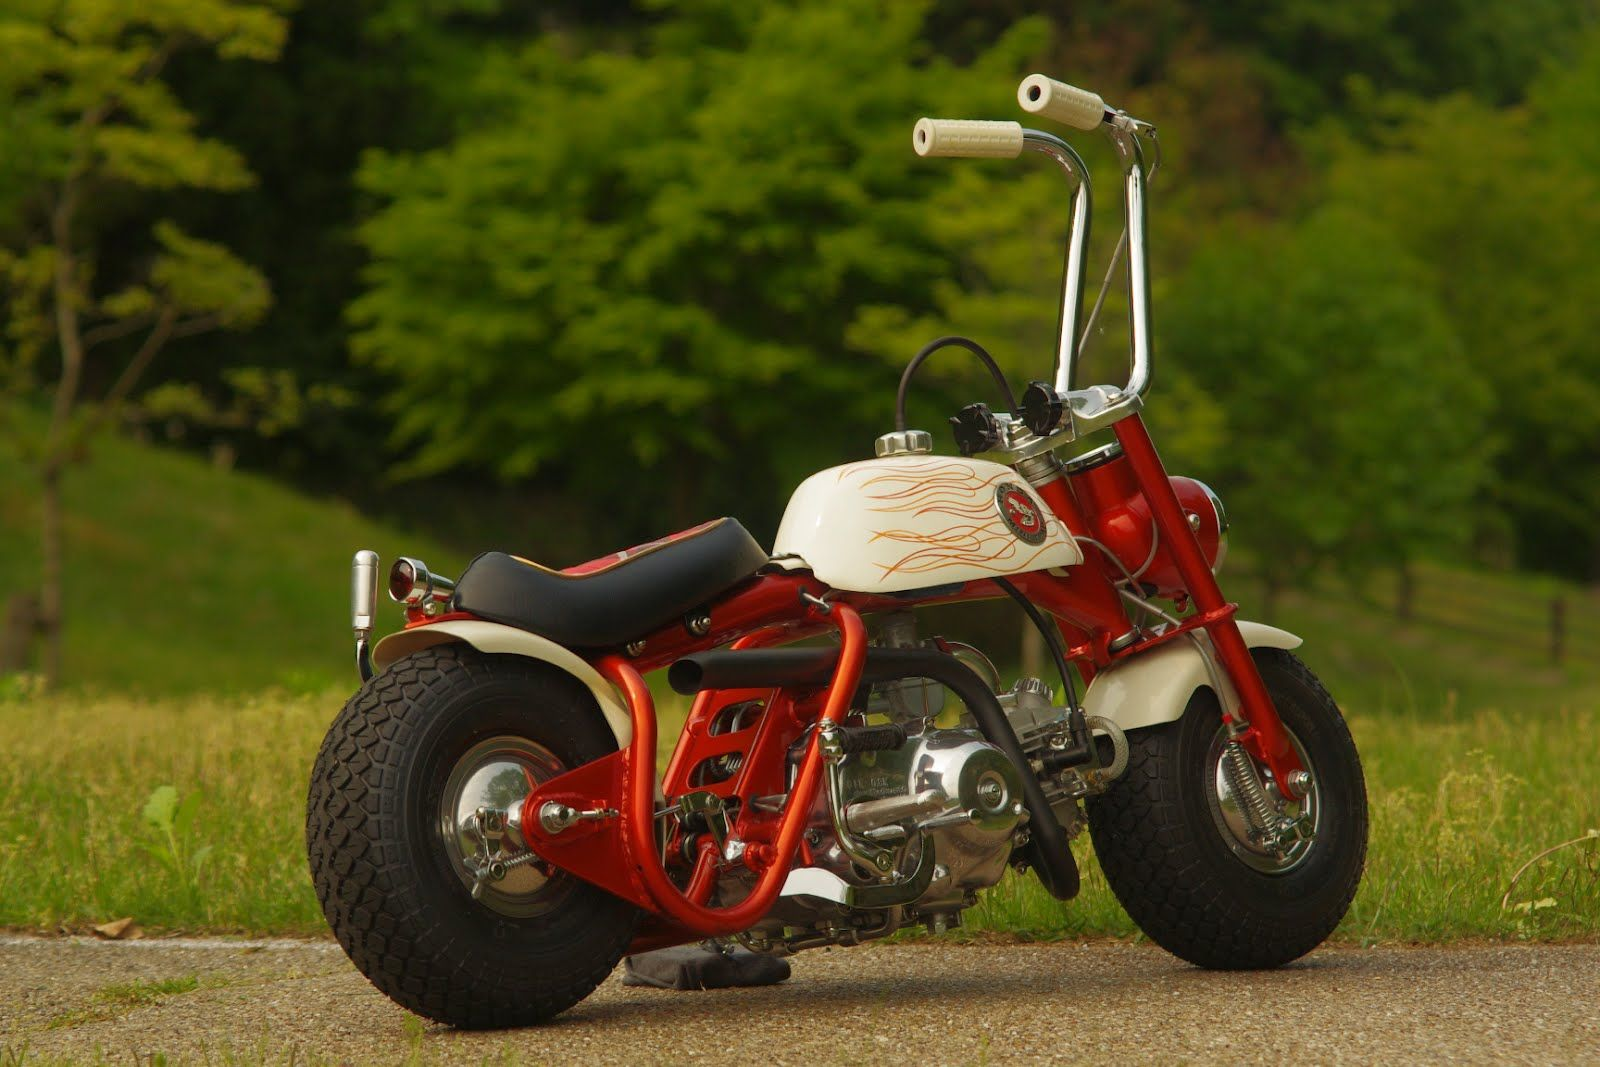 honda mini trail bikes motocicletas motos und solo motos. Black Bedroom Furniture Sets. Home Design Ideas